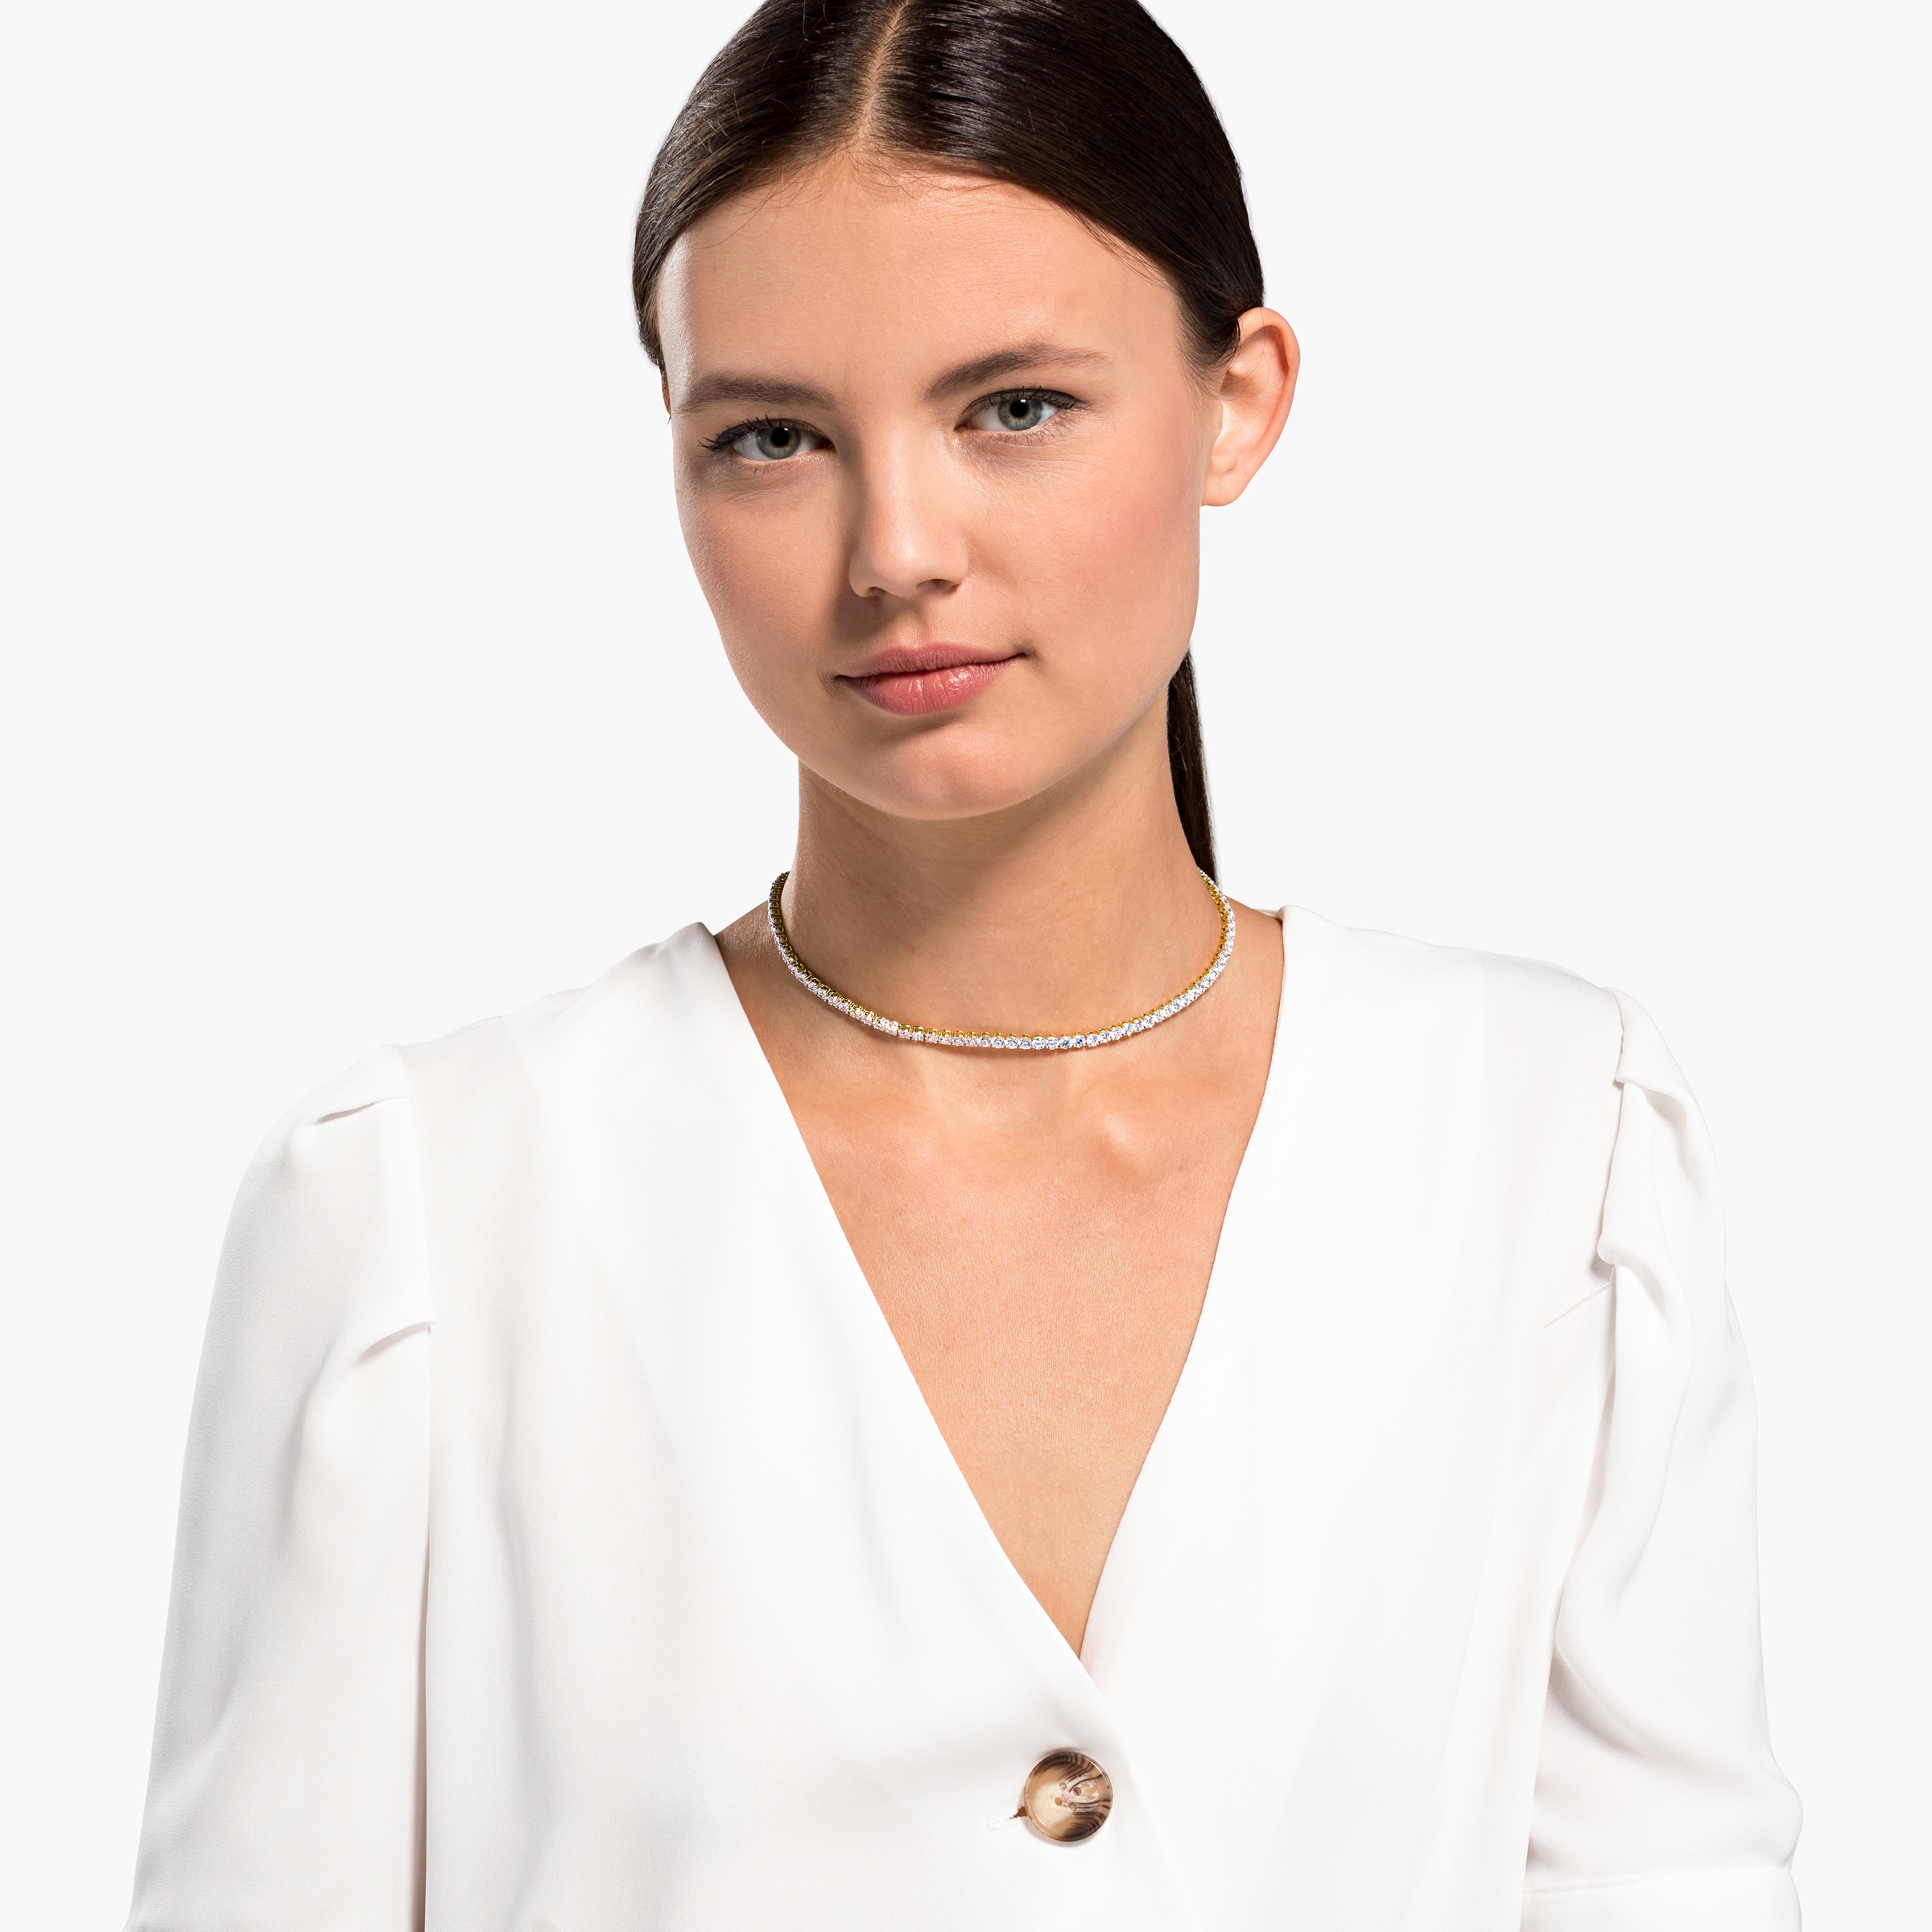 Collier Tennis Deluxe, blanc, métal doré, Swarovski